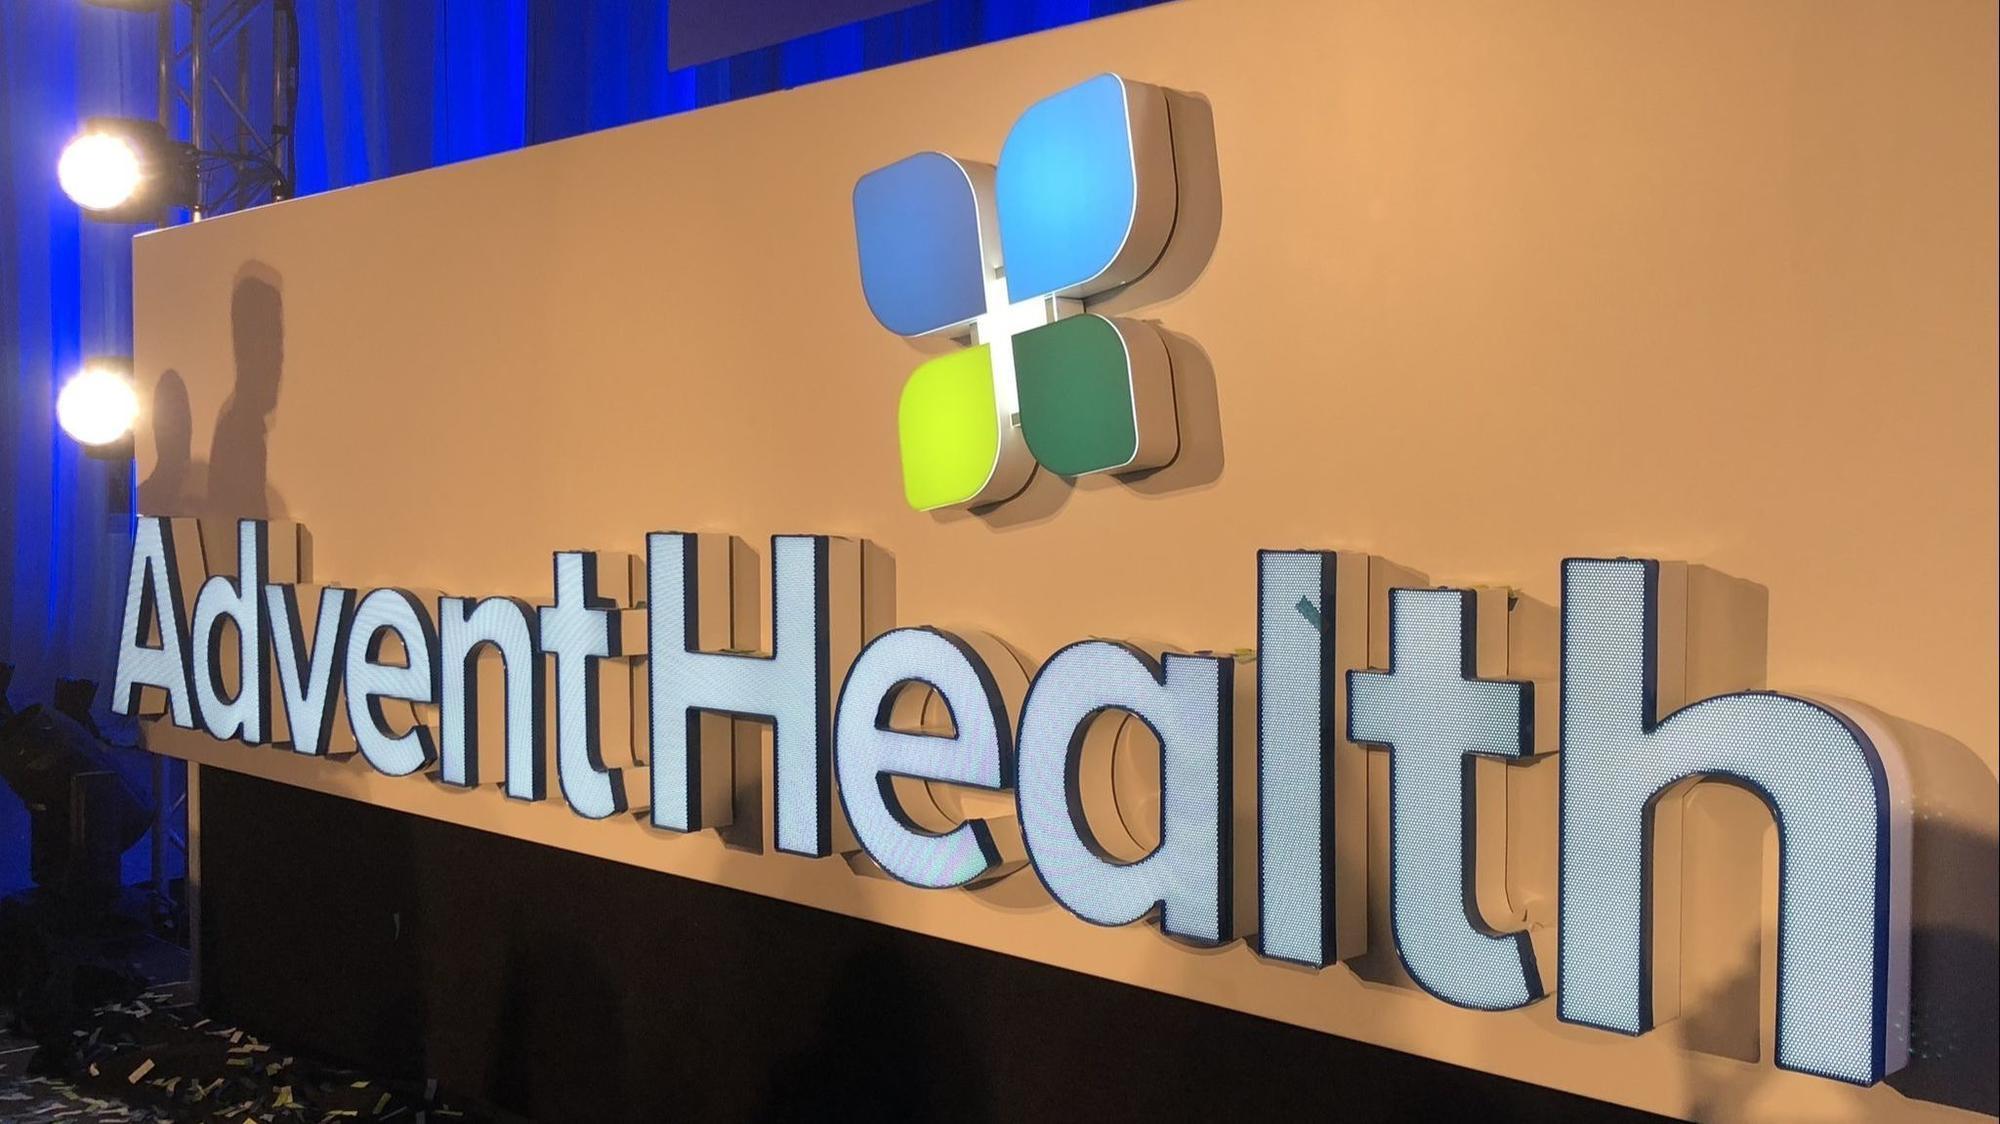 Florida Hospital Adventist Health System Announce New